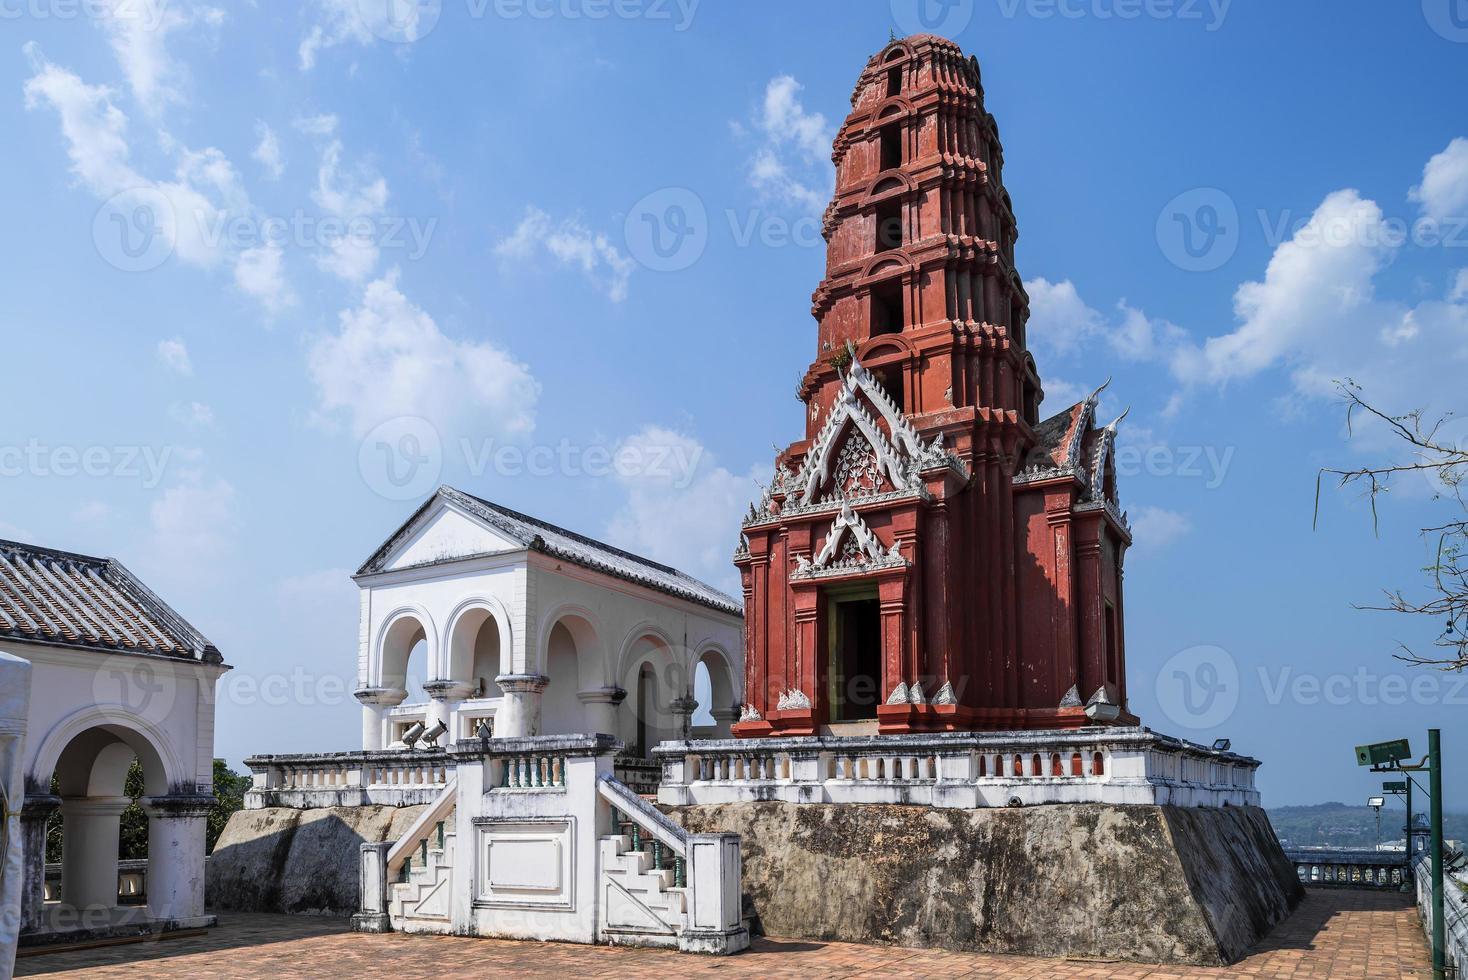 gamla thailändska kungpalats i phetchaburi-provinsen, Thailand foto